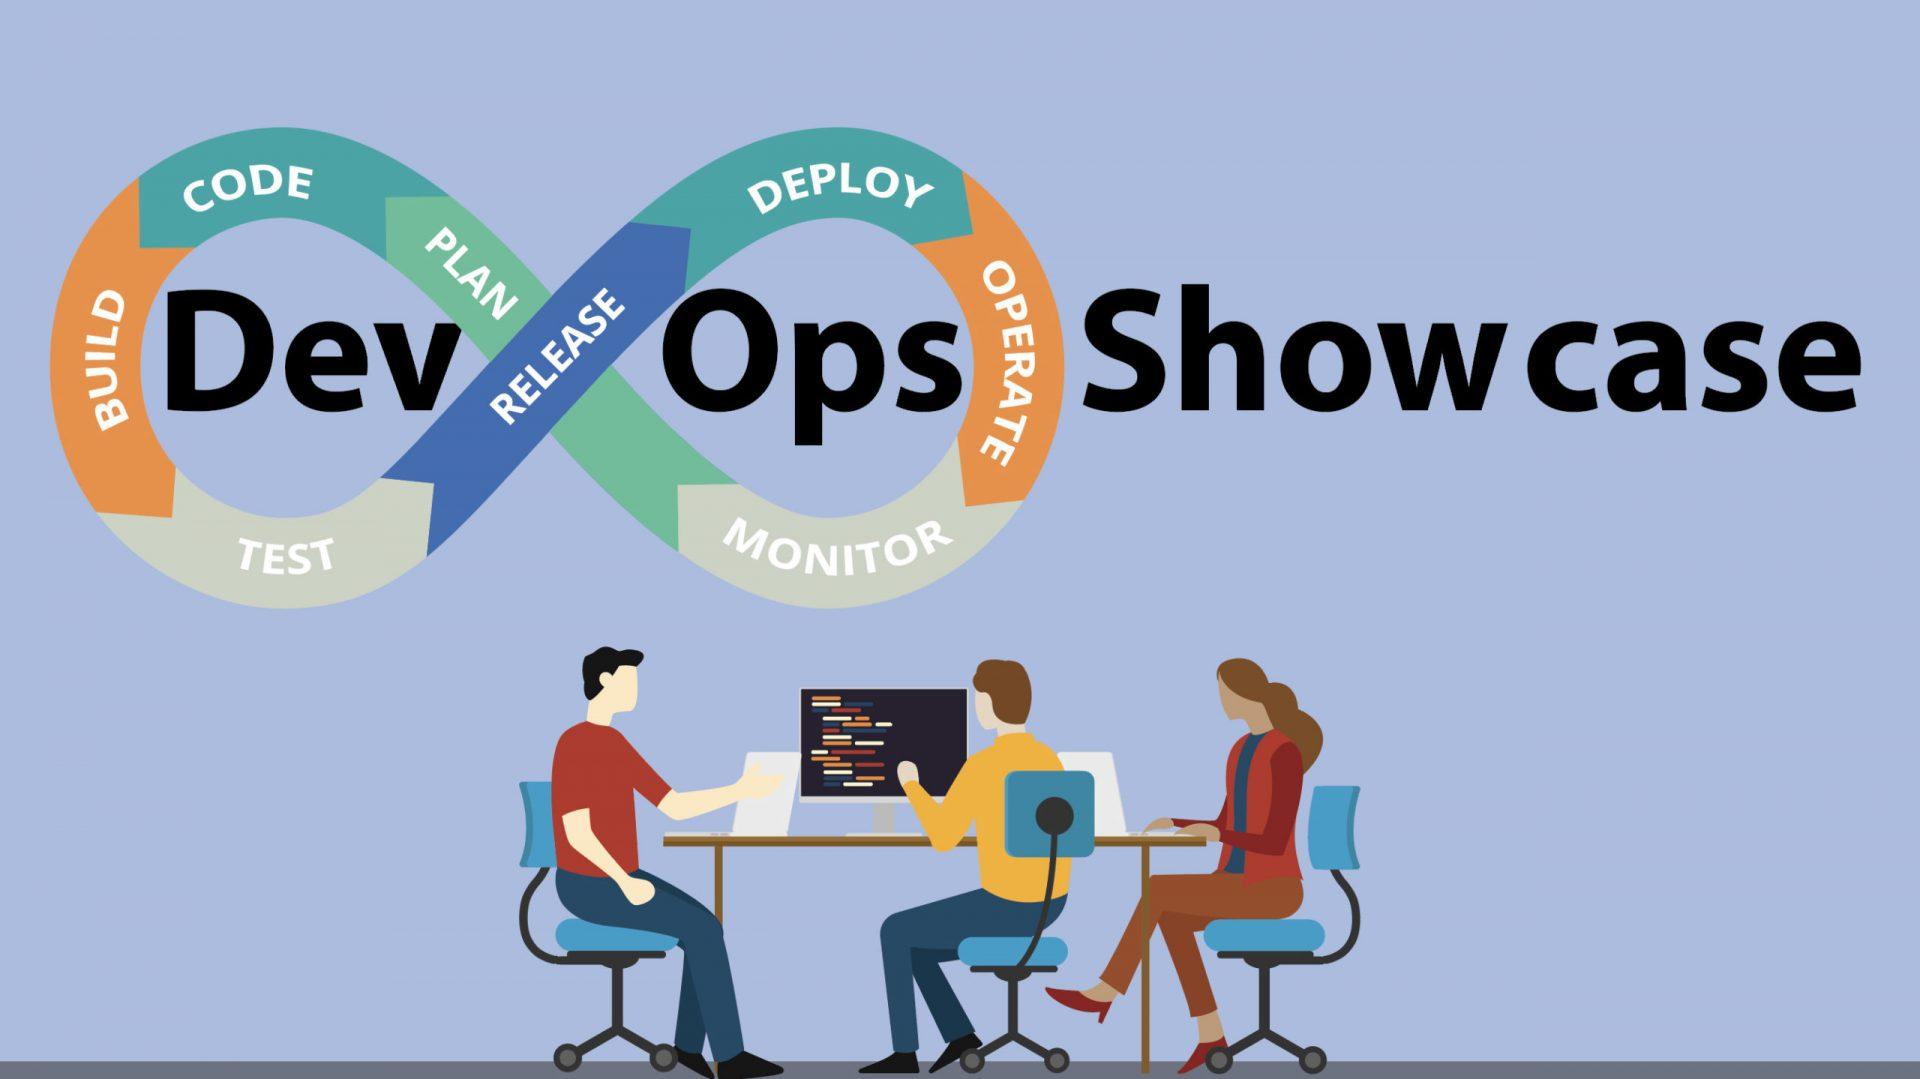 The SD Times DevOps Showcase